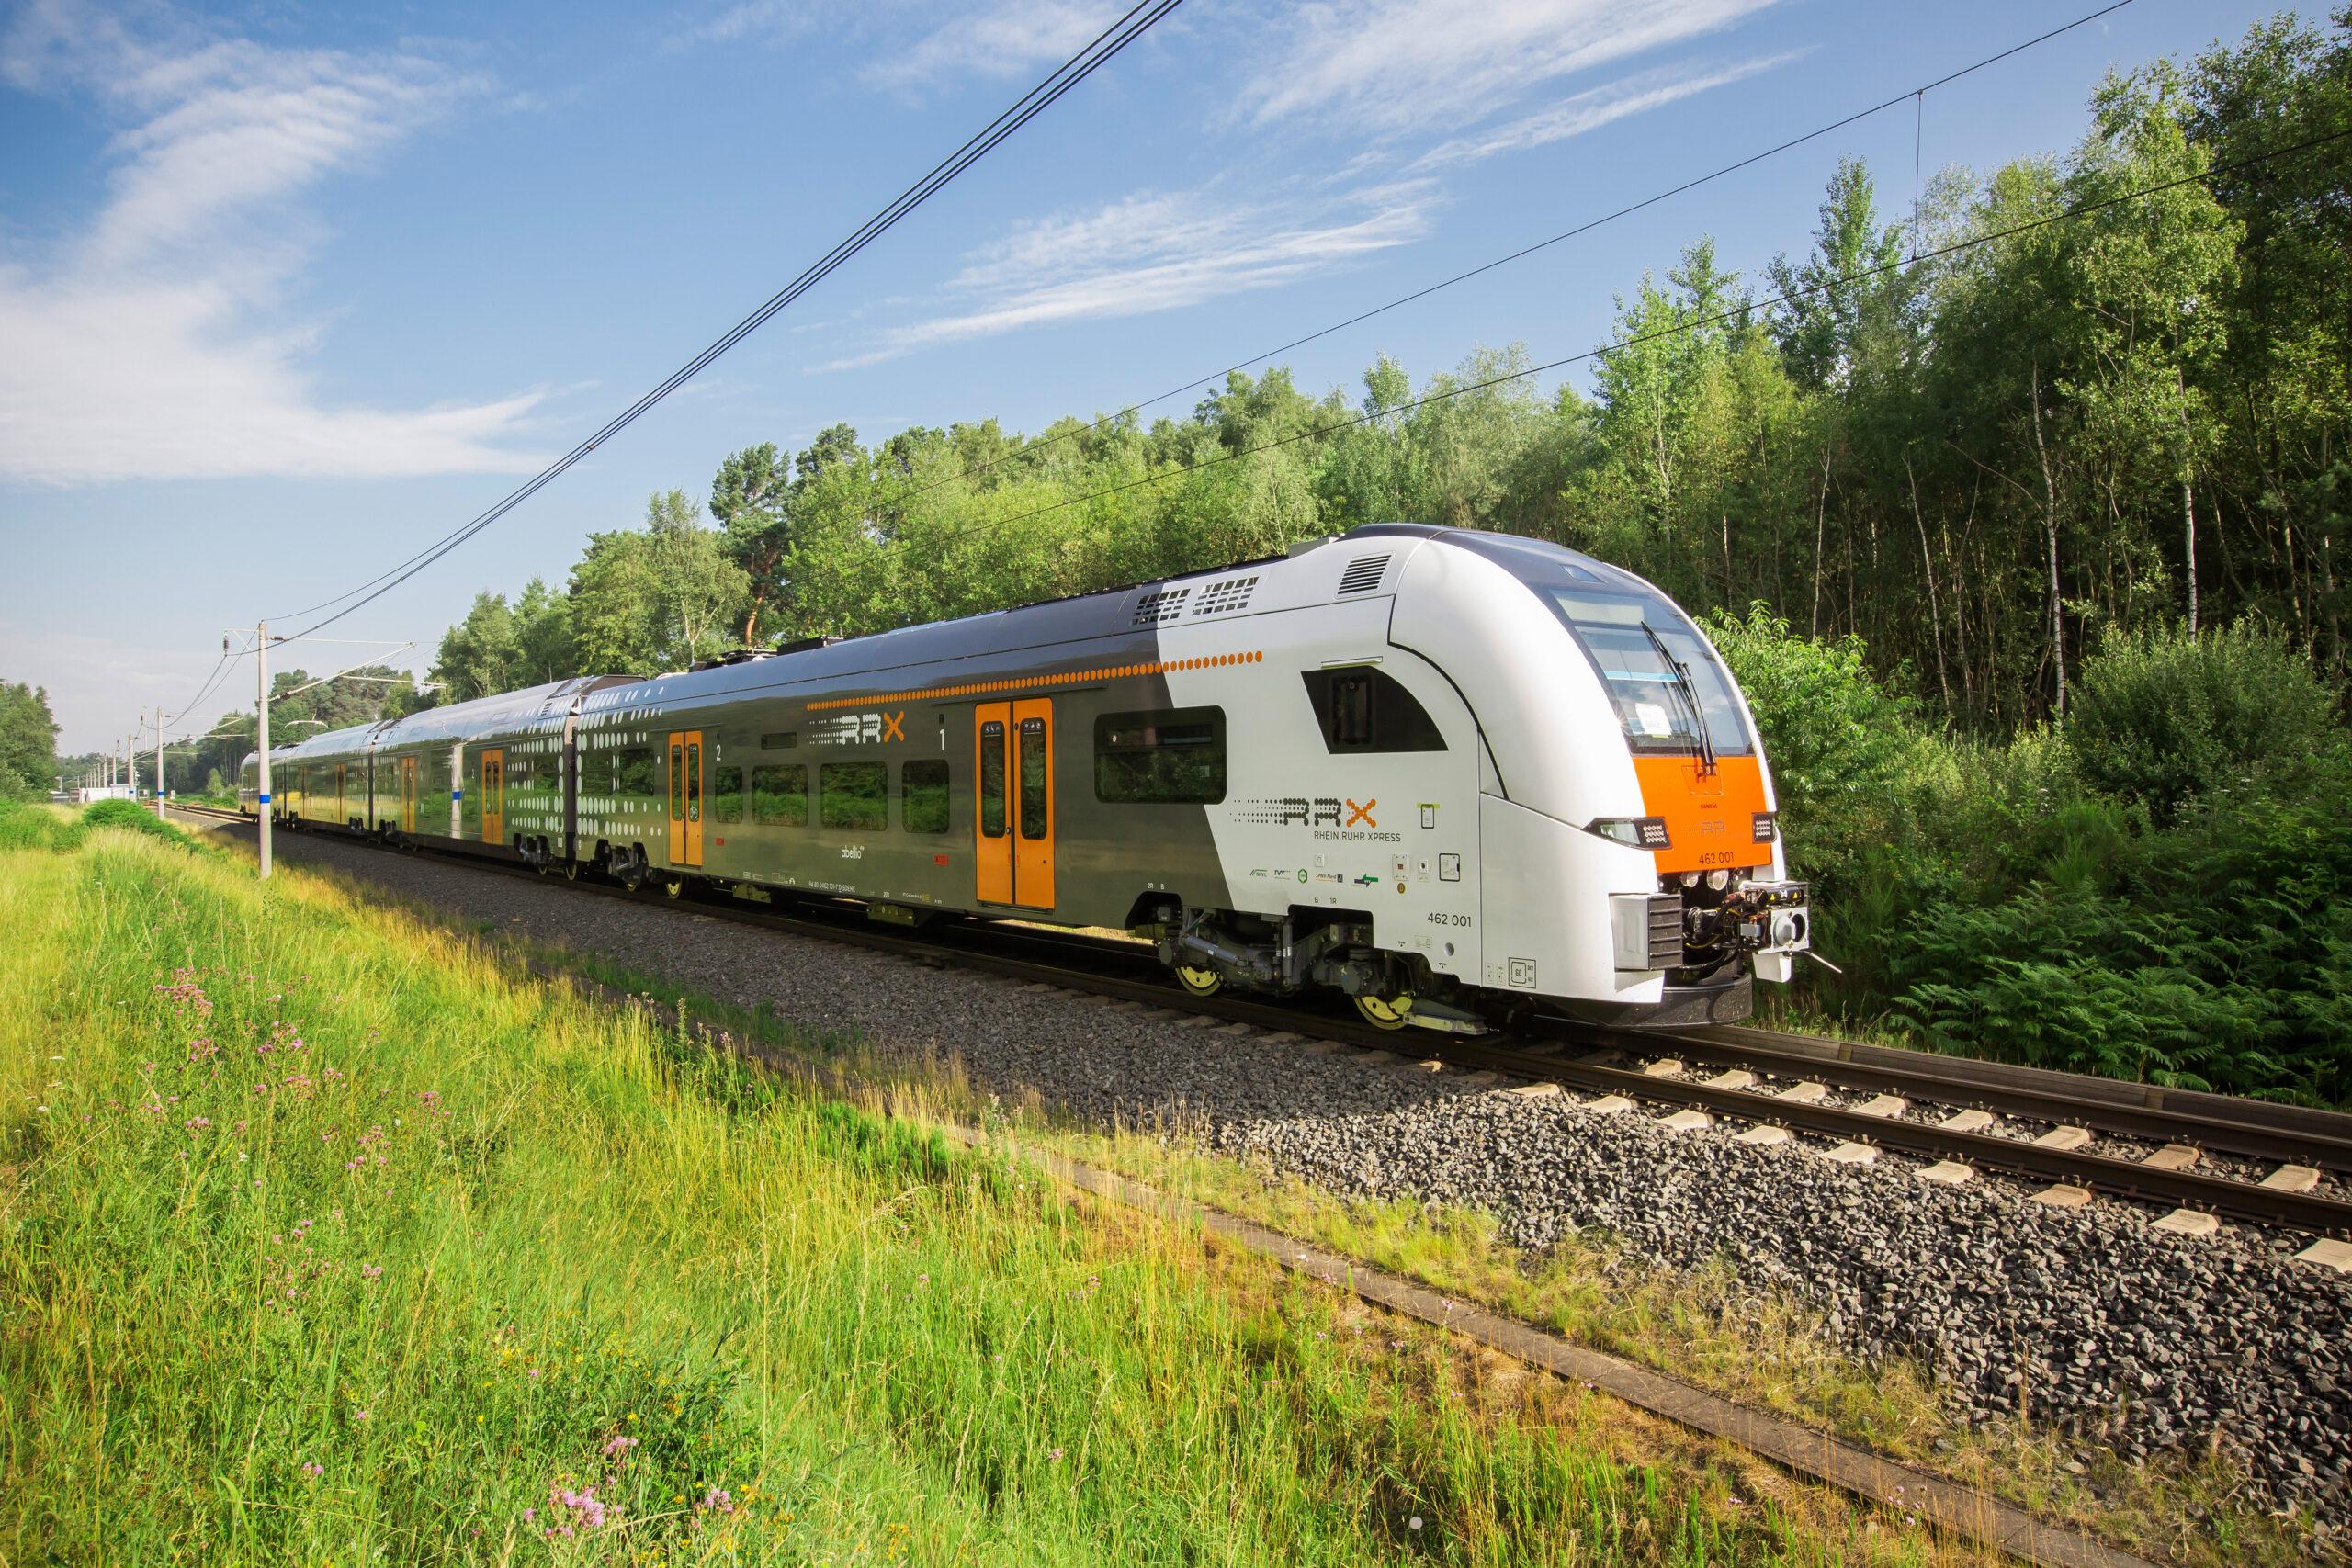 Siemens Mobility RRX – Rhine-Ruhr Express